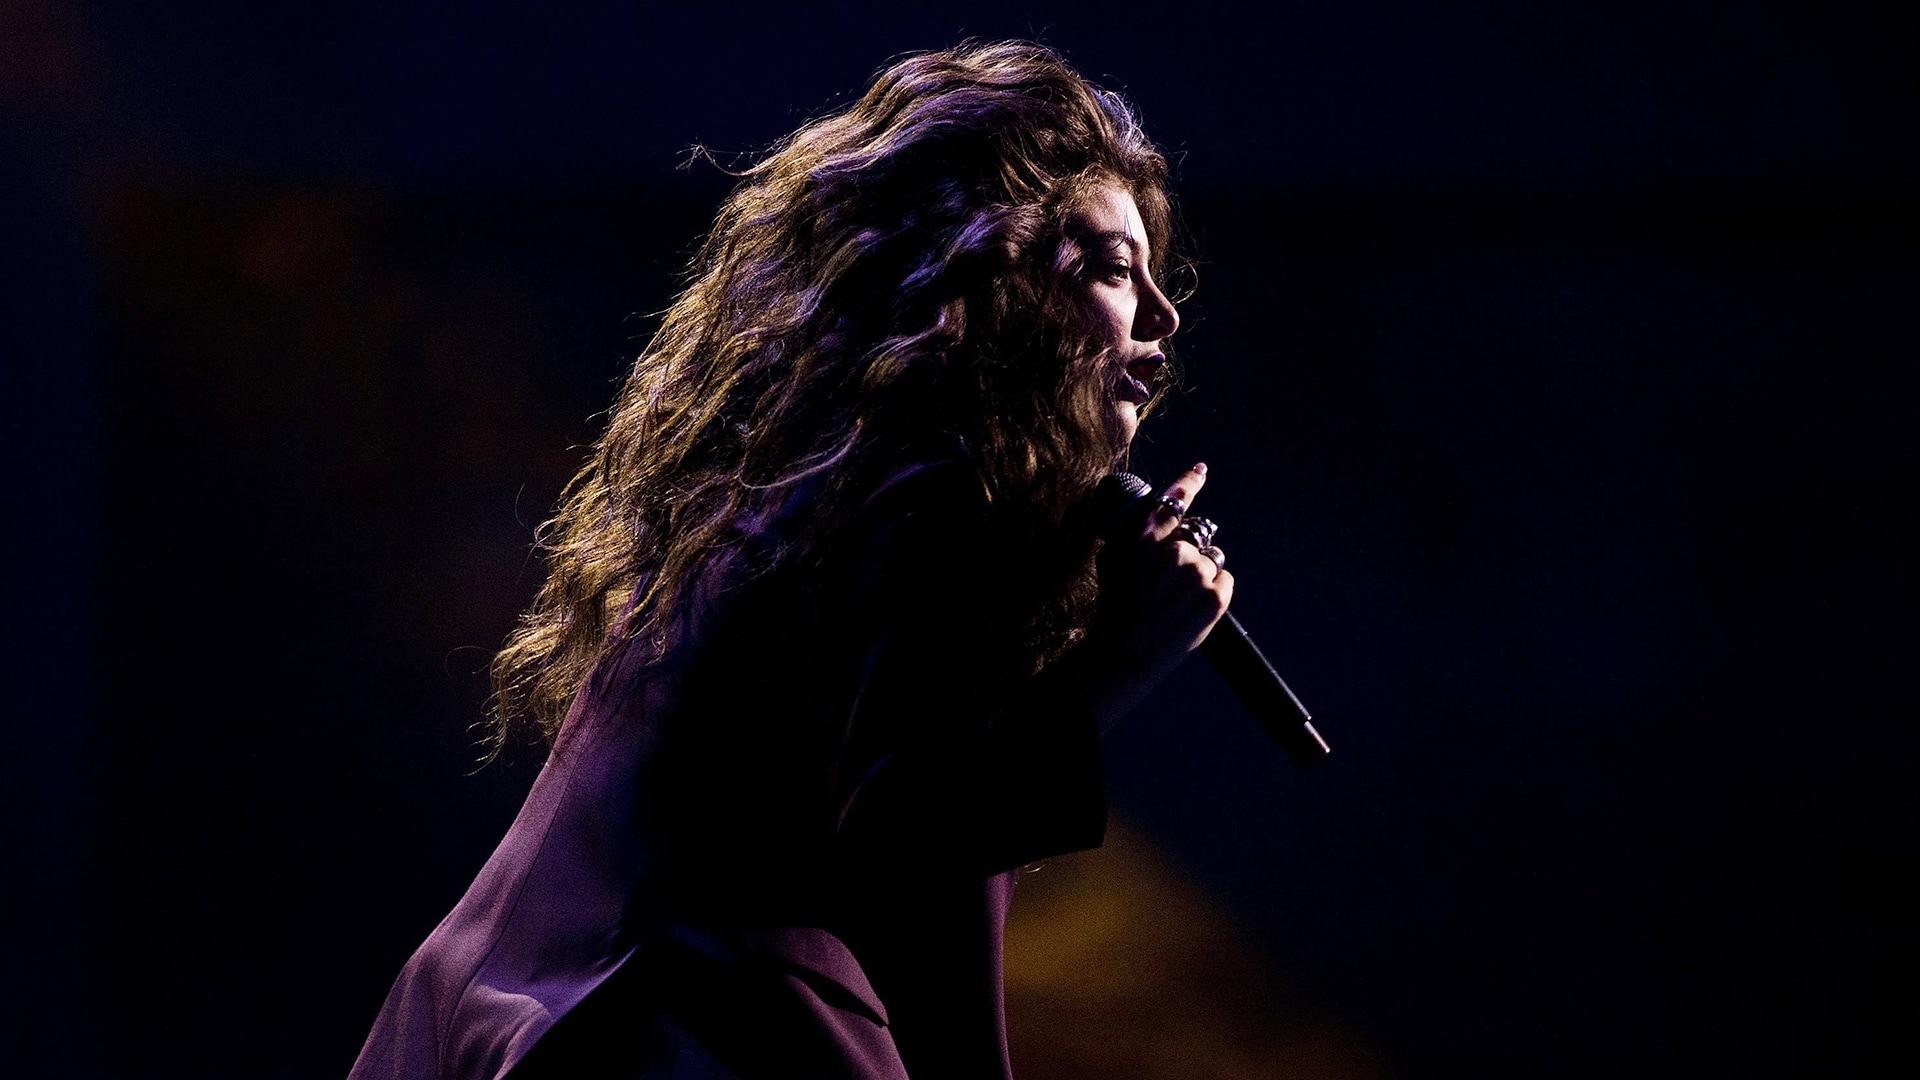 Image: Lorde